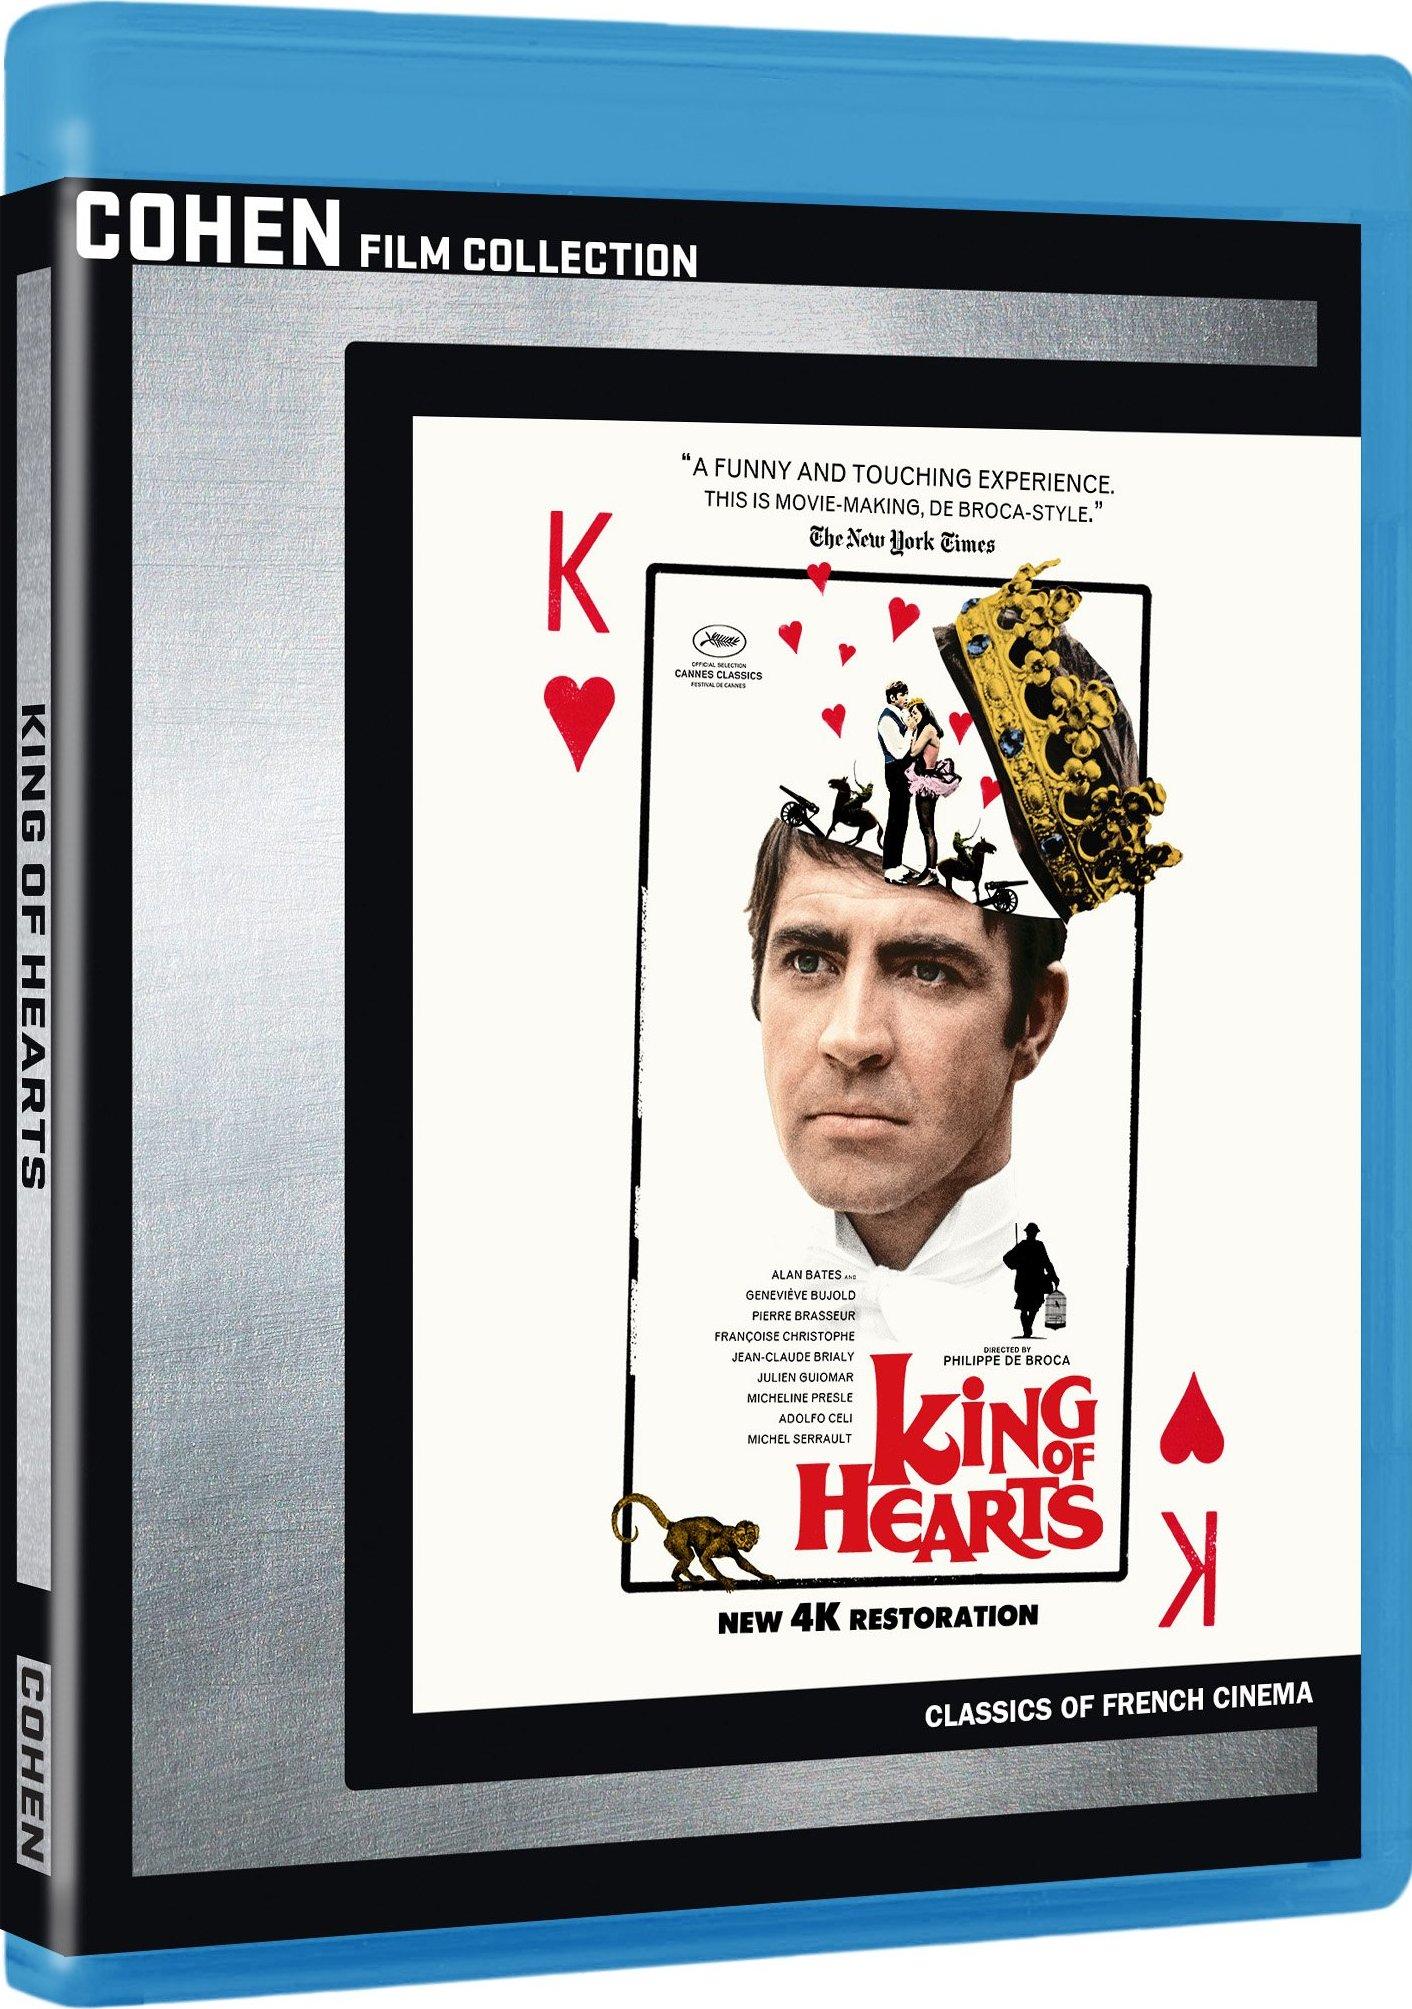 King of Hearts (1966) Blu-ray